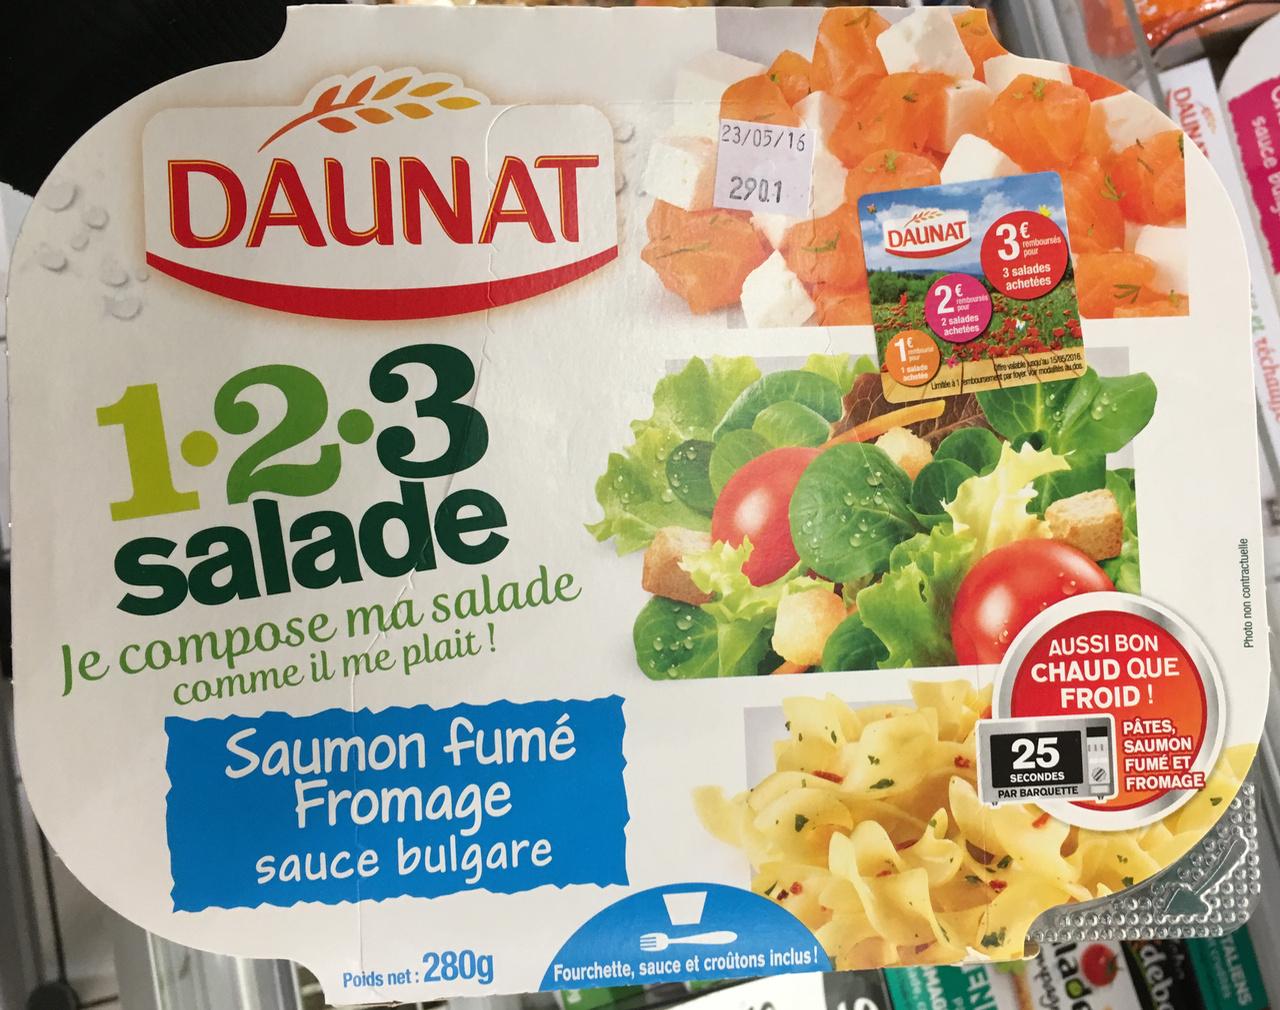 1-2-3 Salade Saumon fumé Fromage sauce bulgare - Produit - fr